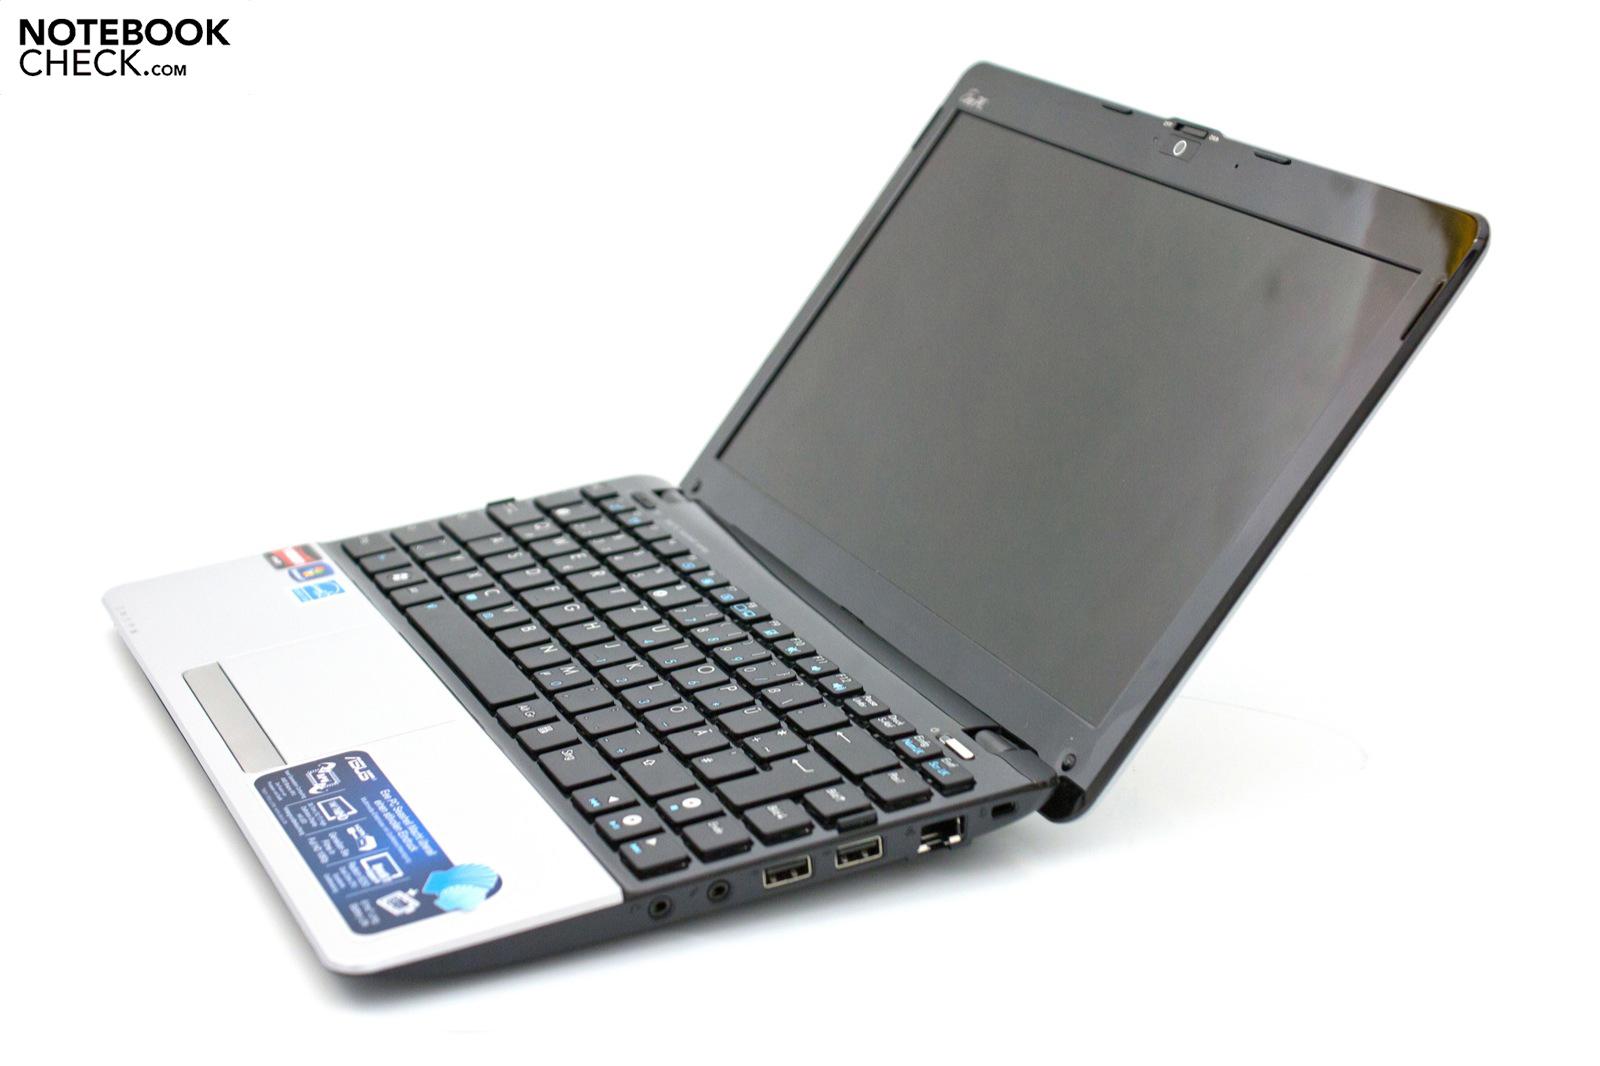 Asus Eee PC 1215P Netbook USB 3.0 Drivers for Mac